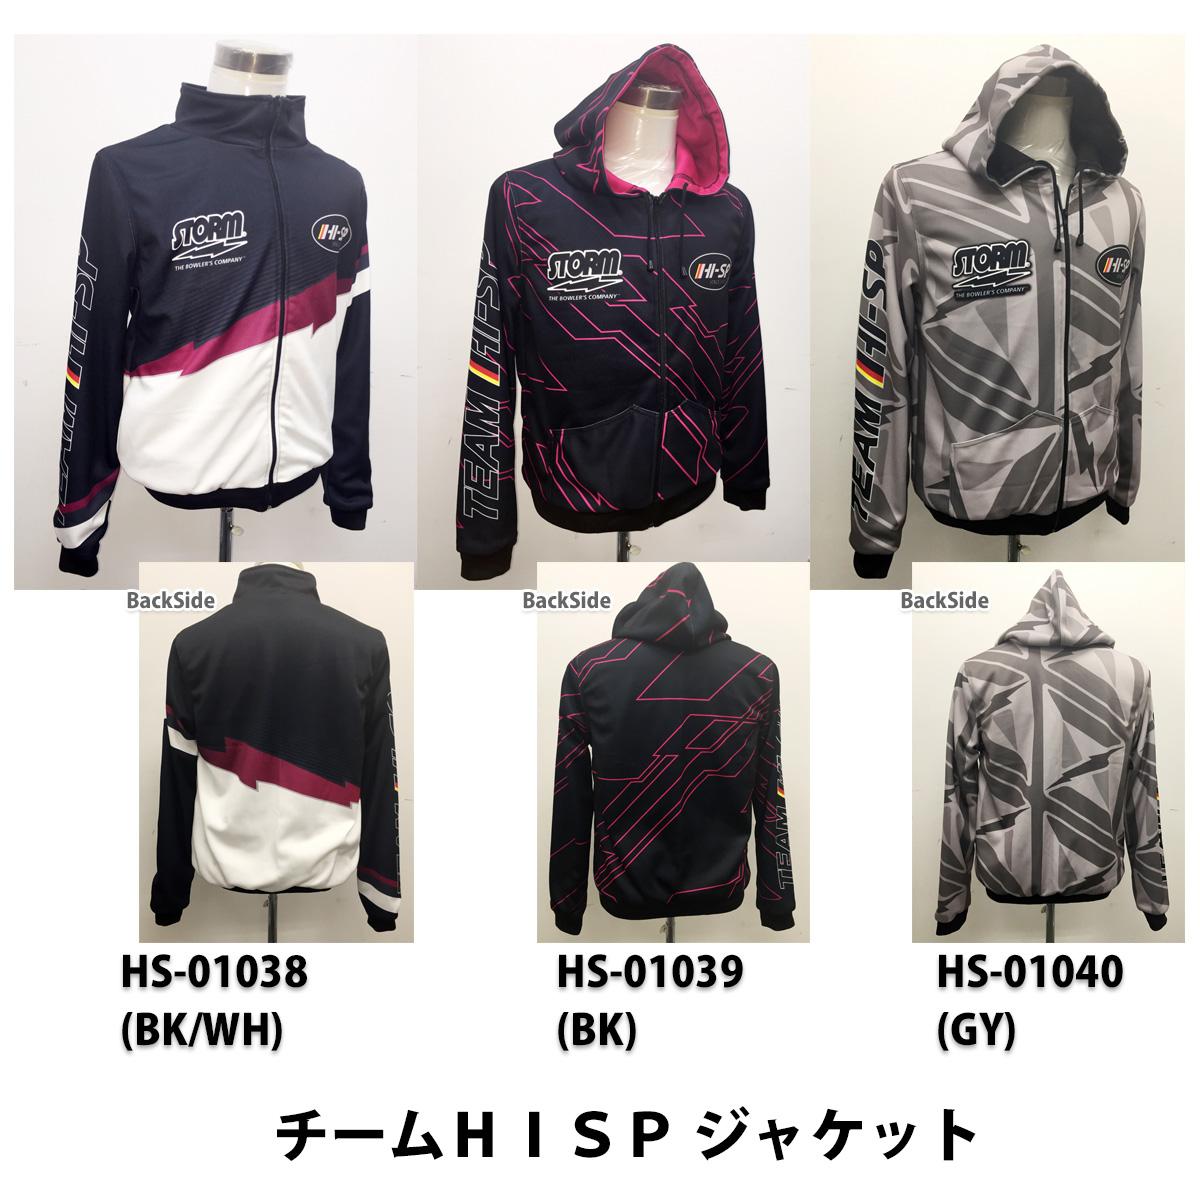 【HI-SPORTS】HS-01038~HS-01040 チームHISP ジャケット